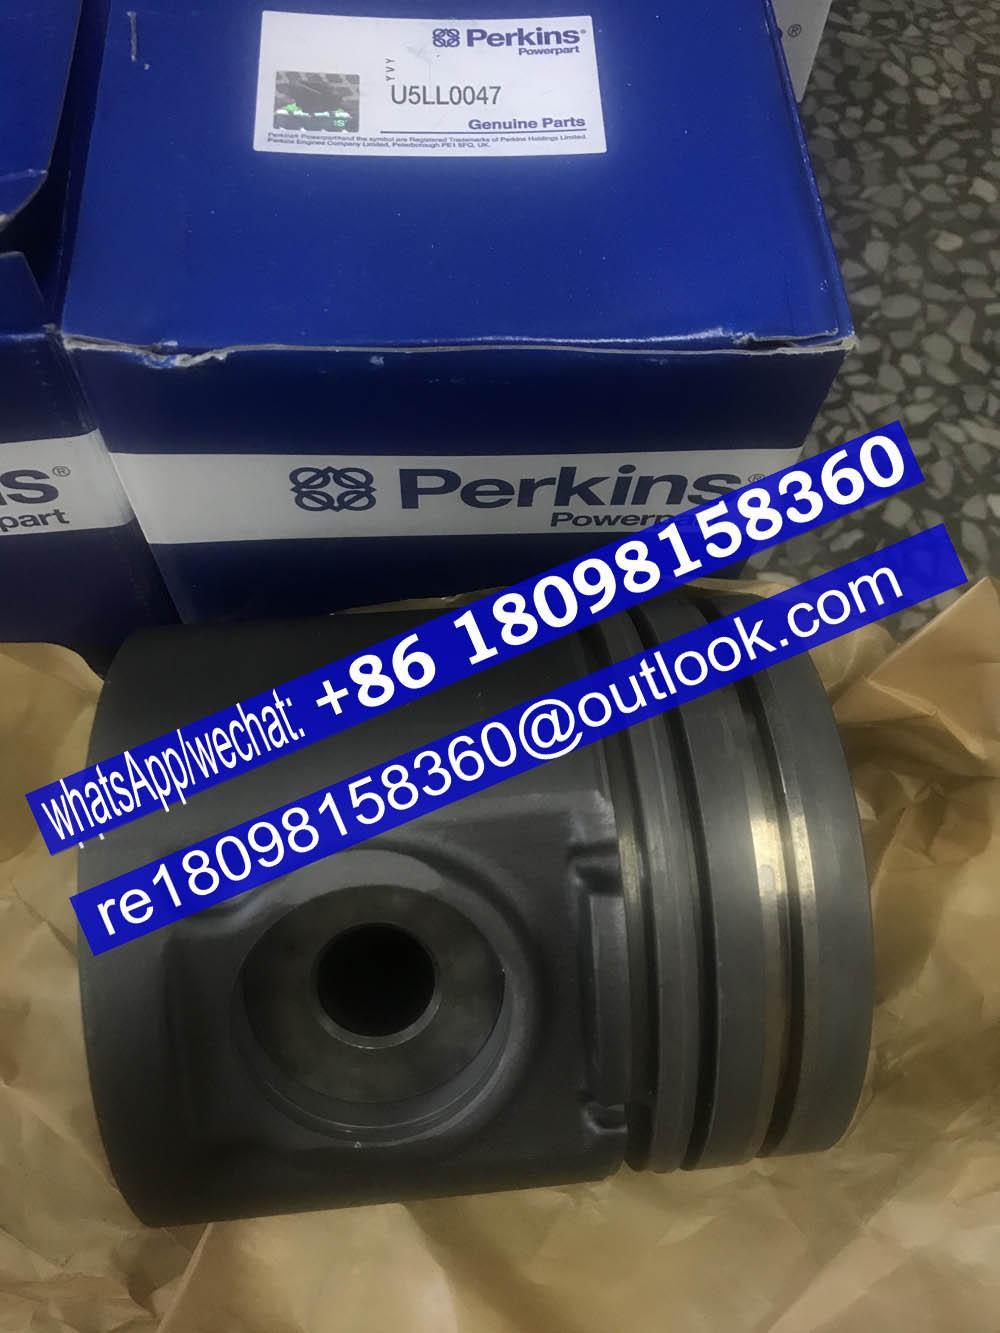 U5LF0047 U5LF0021 Perkins Piston for 1006-6 series engine partS